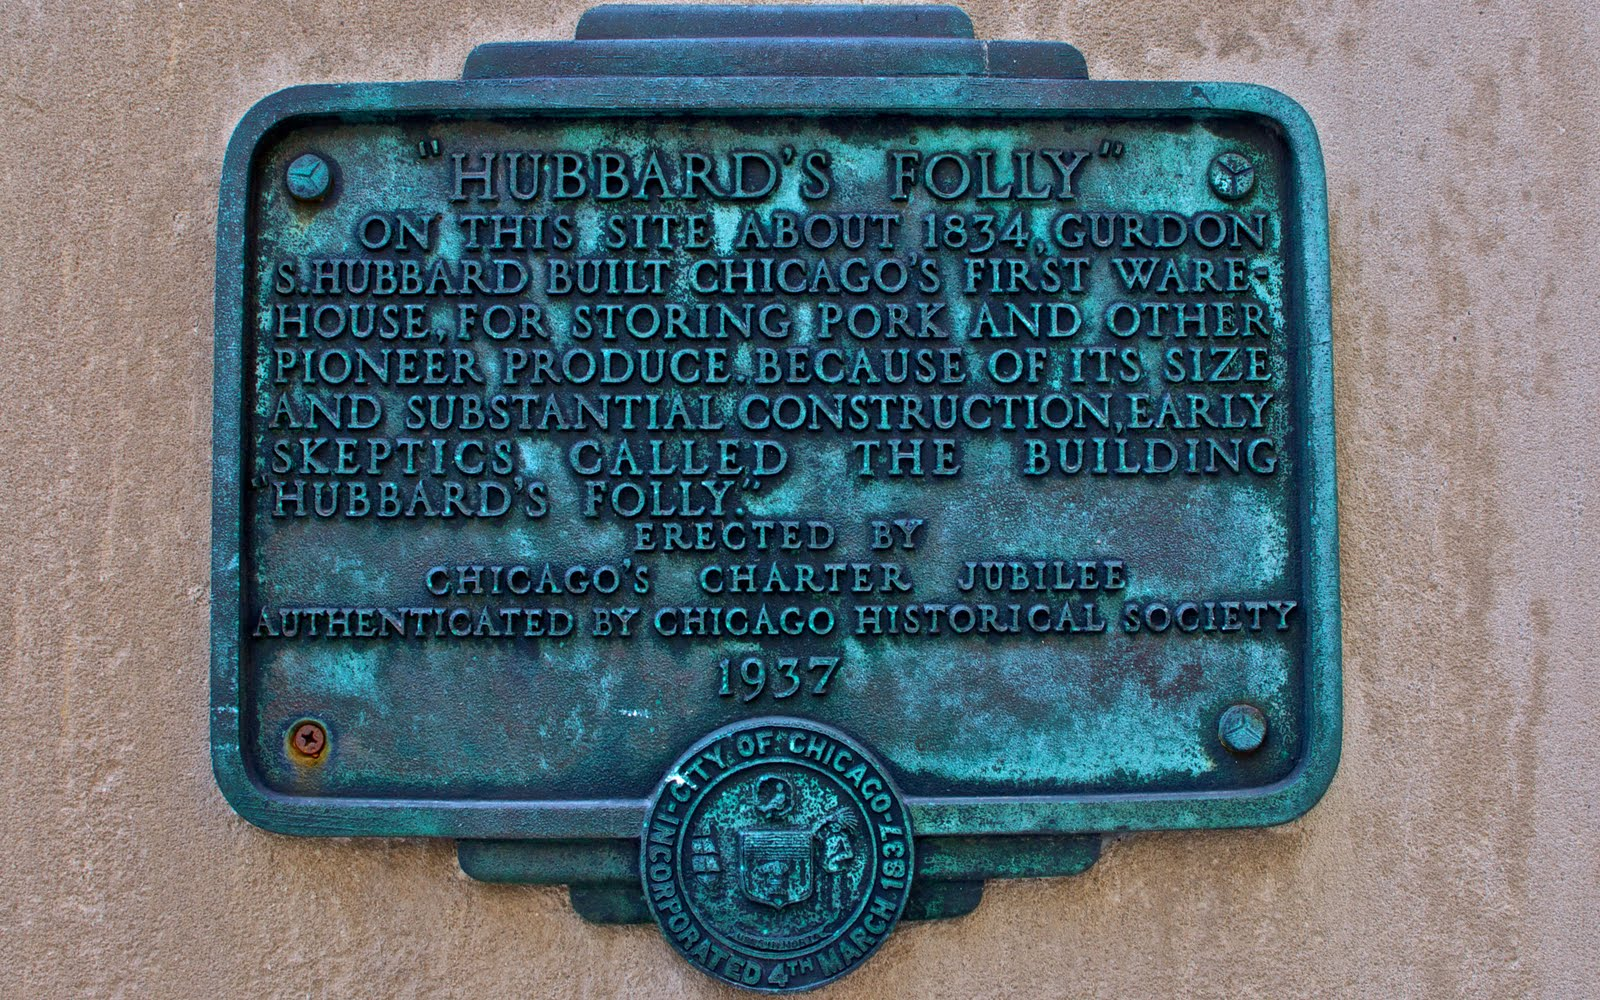 Hubbard's Folly plaque